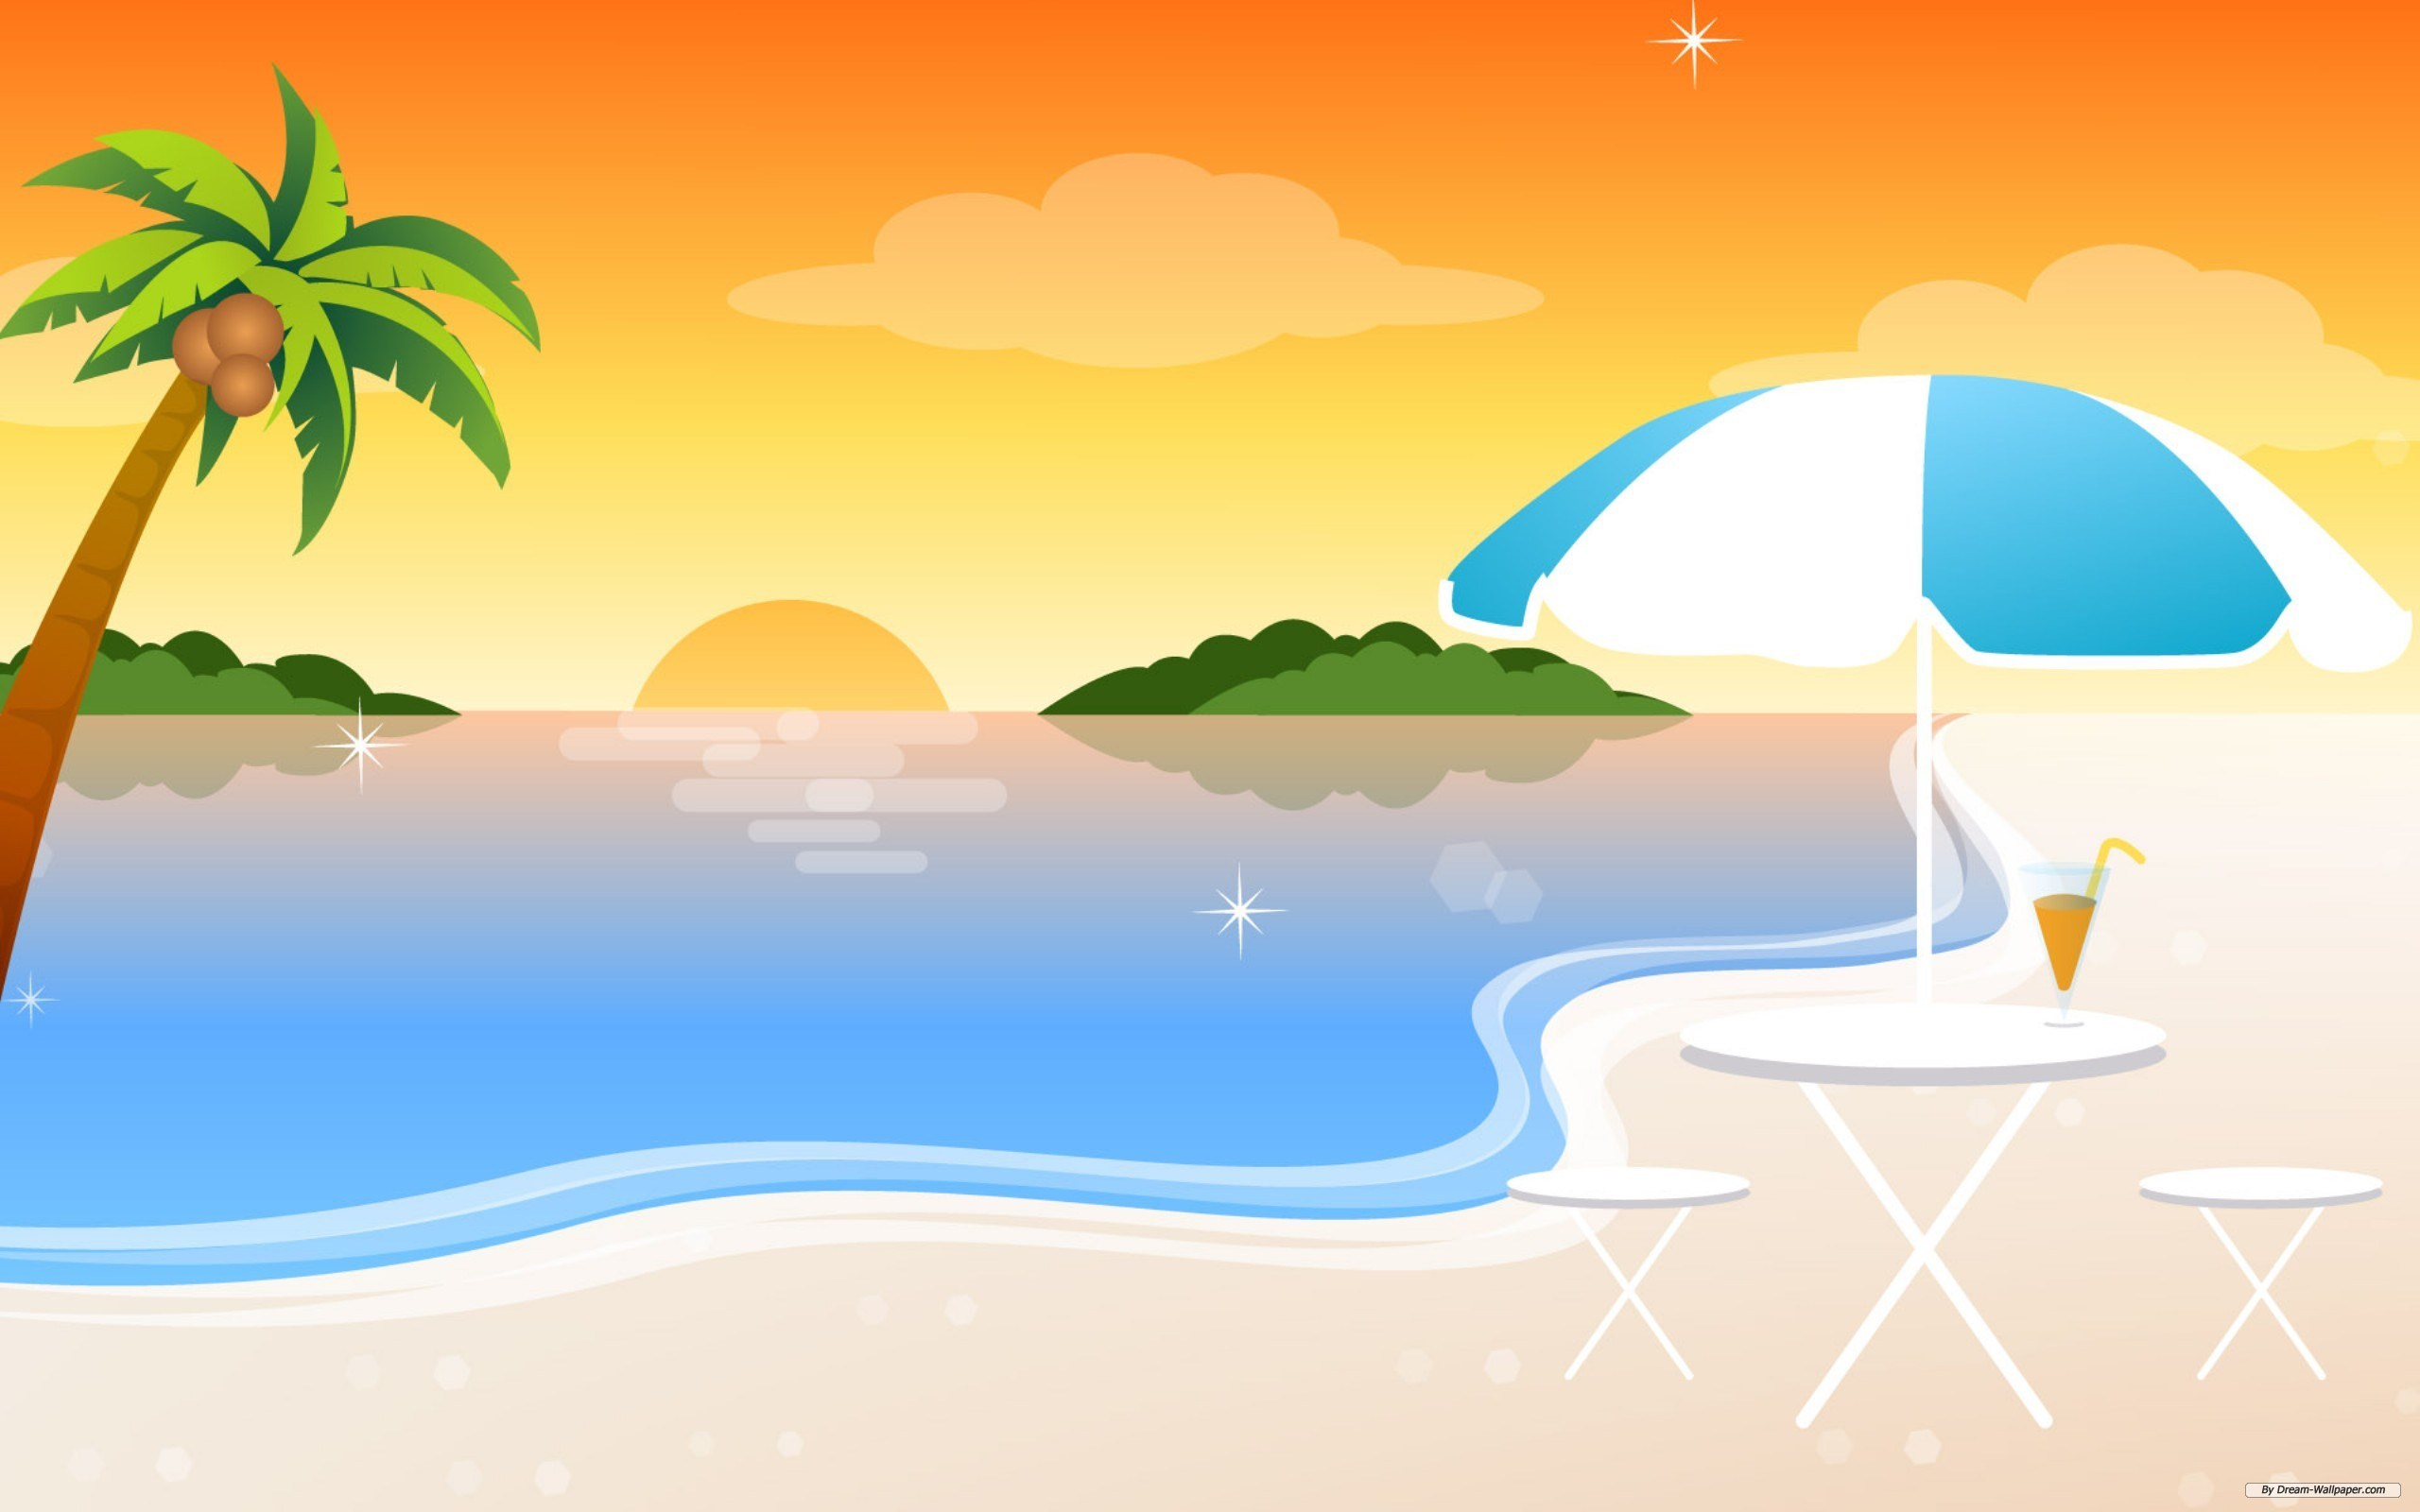 Clipart sunset beach clip art royalty free stock Sunset beach clipart 5 » Clipart Portal clip art royalty free stock